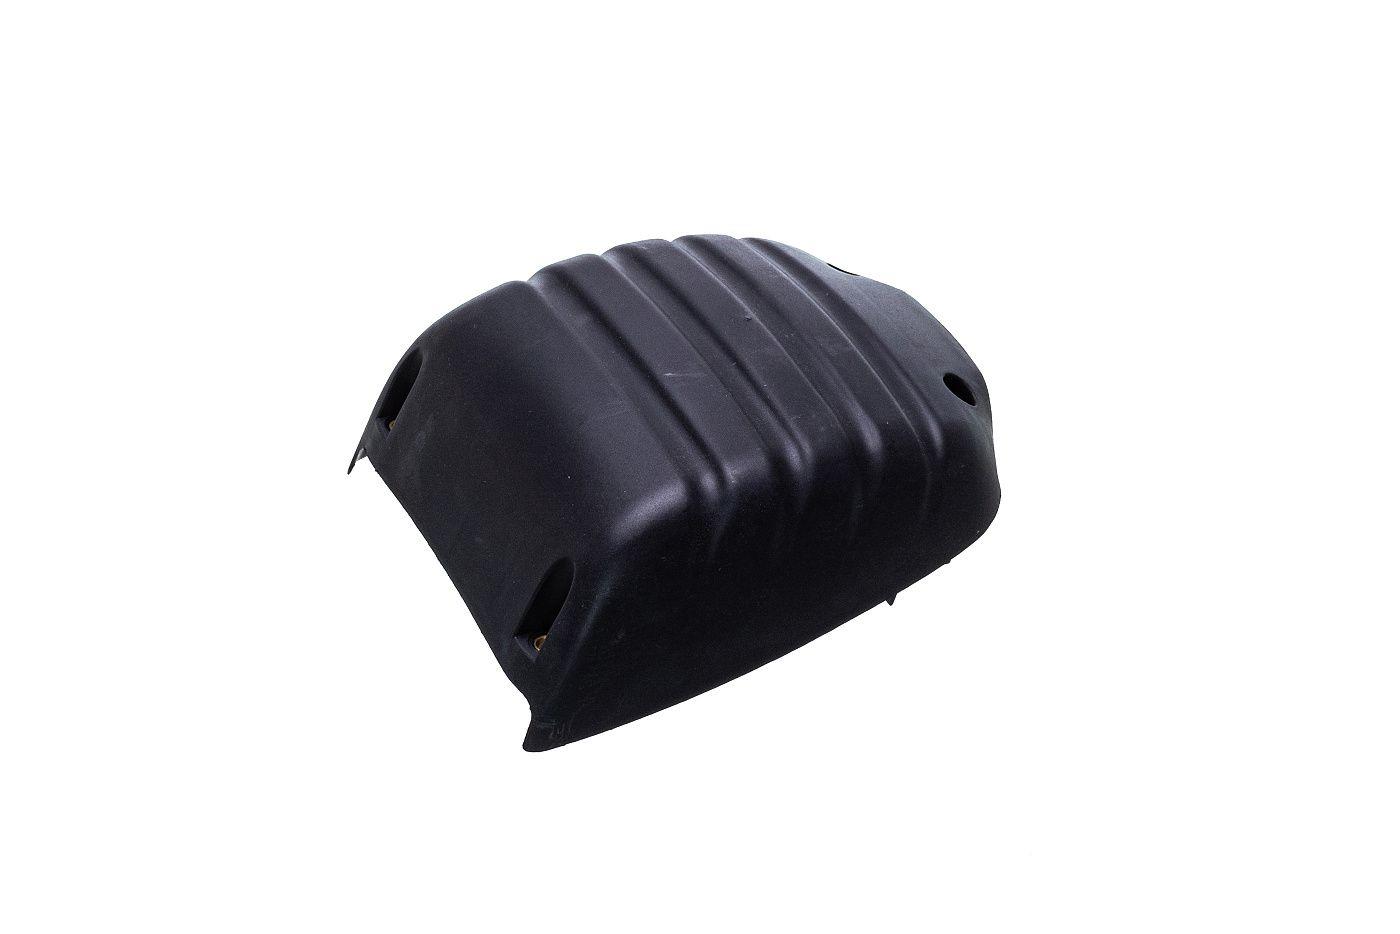 Kryt vzduchového filtra STIHL TS410 TS420 TS480i TS500i - 4238 140 1000